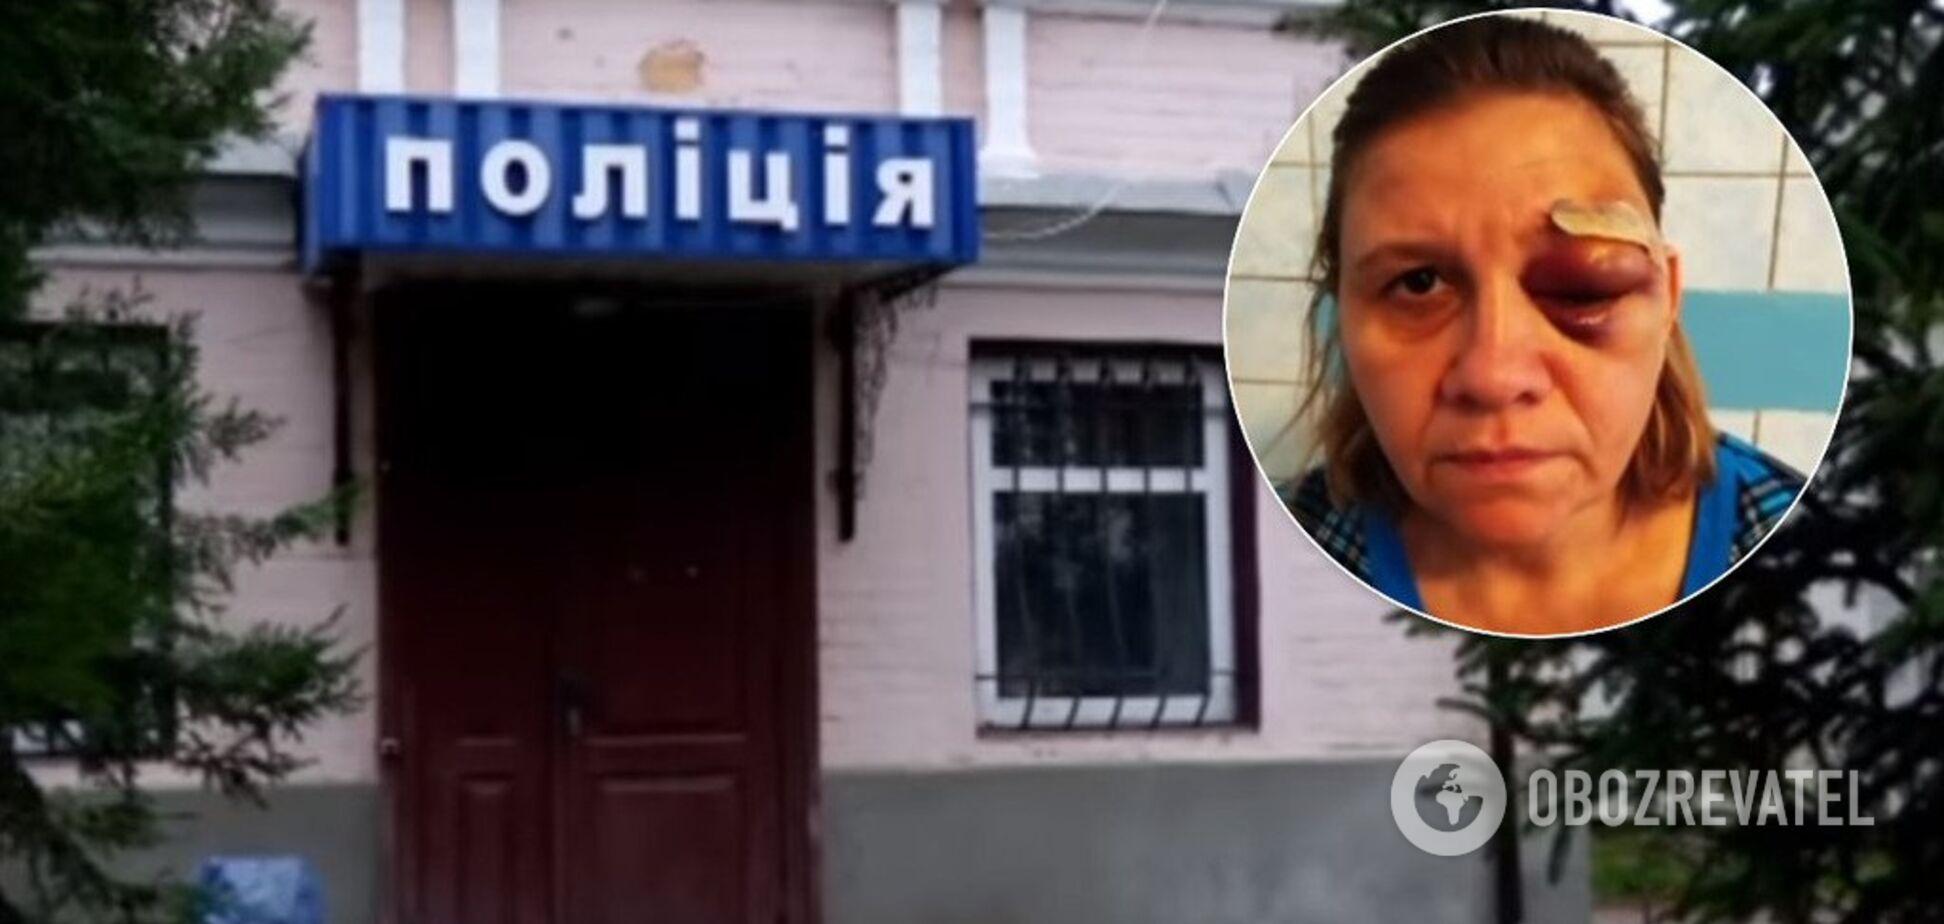 'Отрублю руки, вырву языки!' На Черкасщине экс-милиционер избил семью. Фото и видео